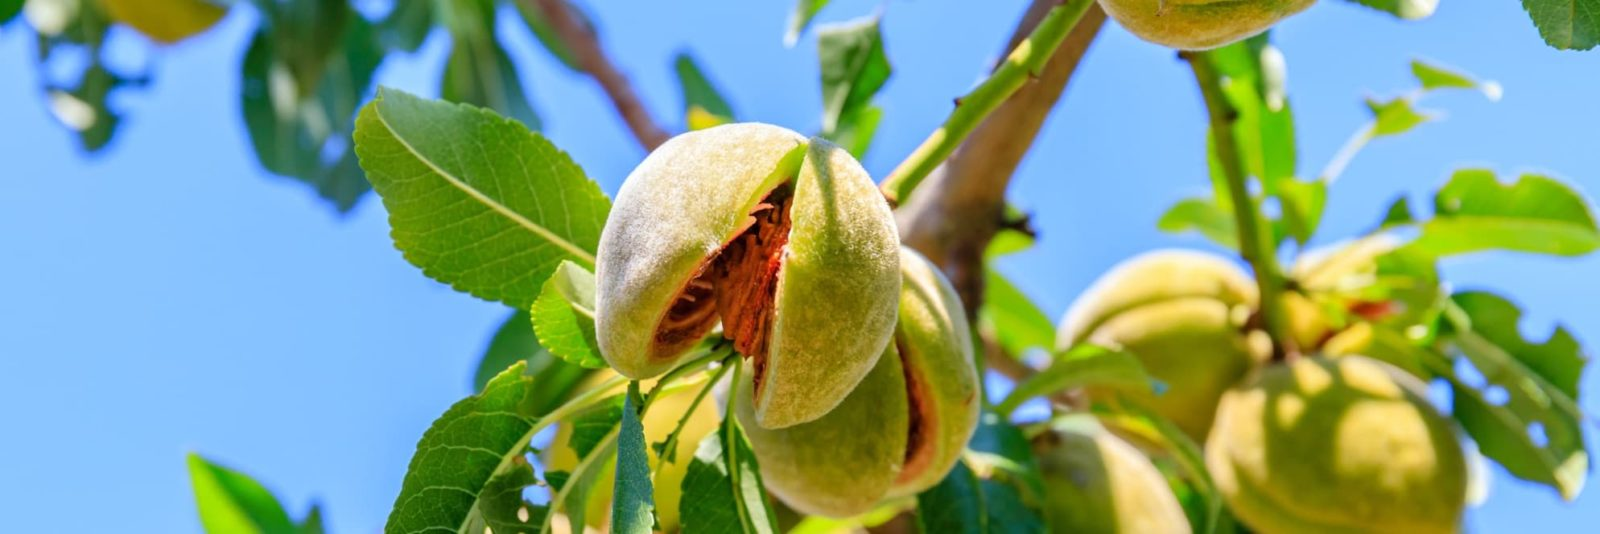 ripe almonds growing on a tree